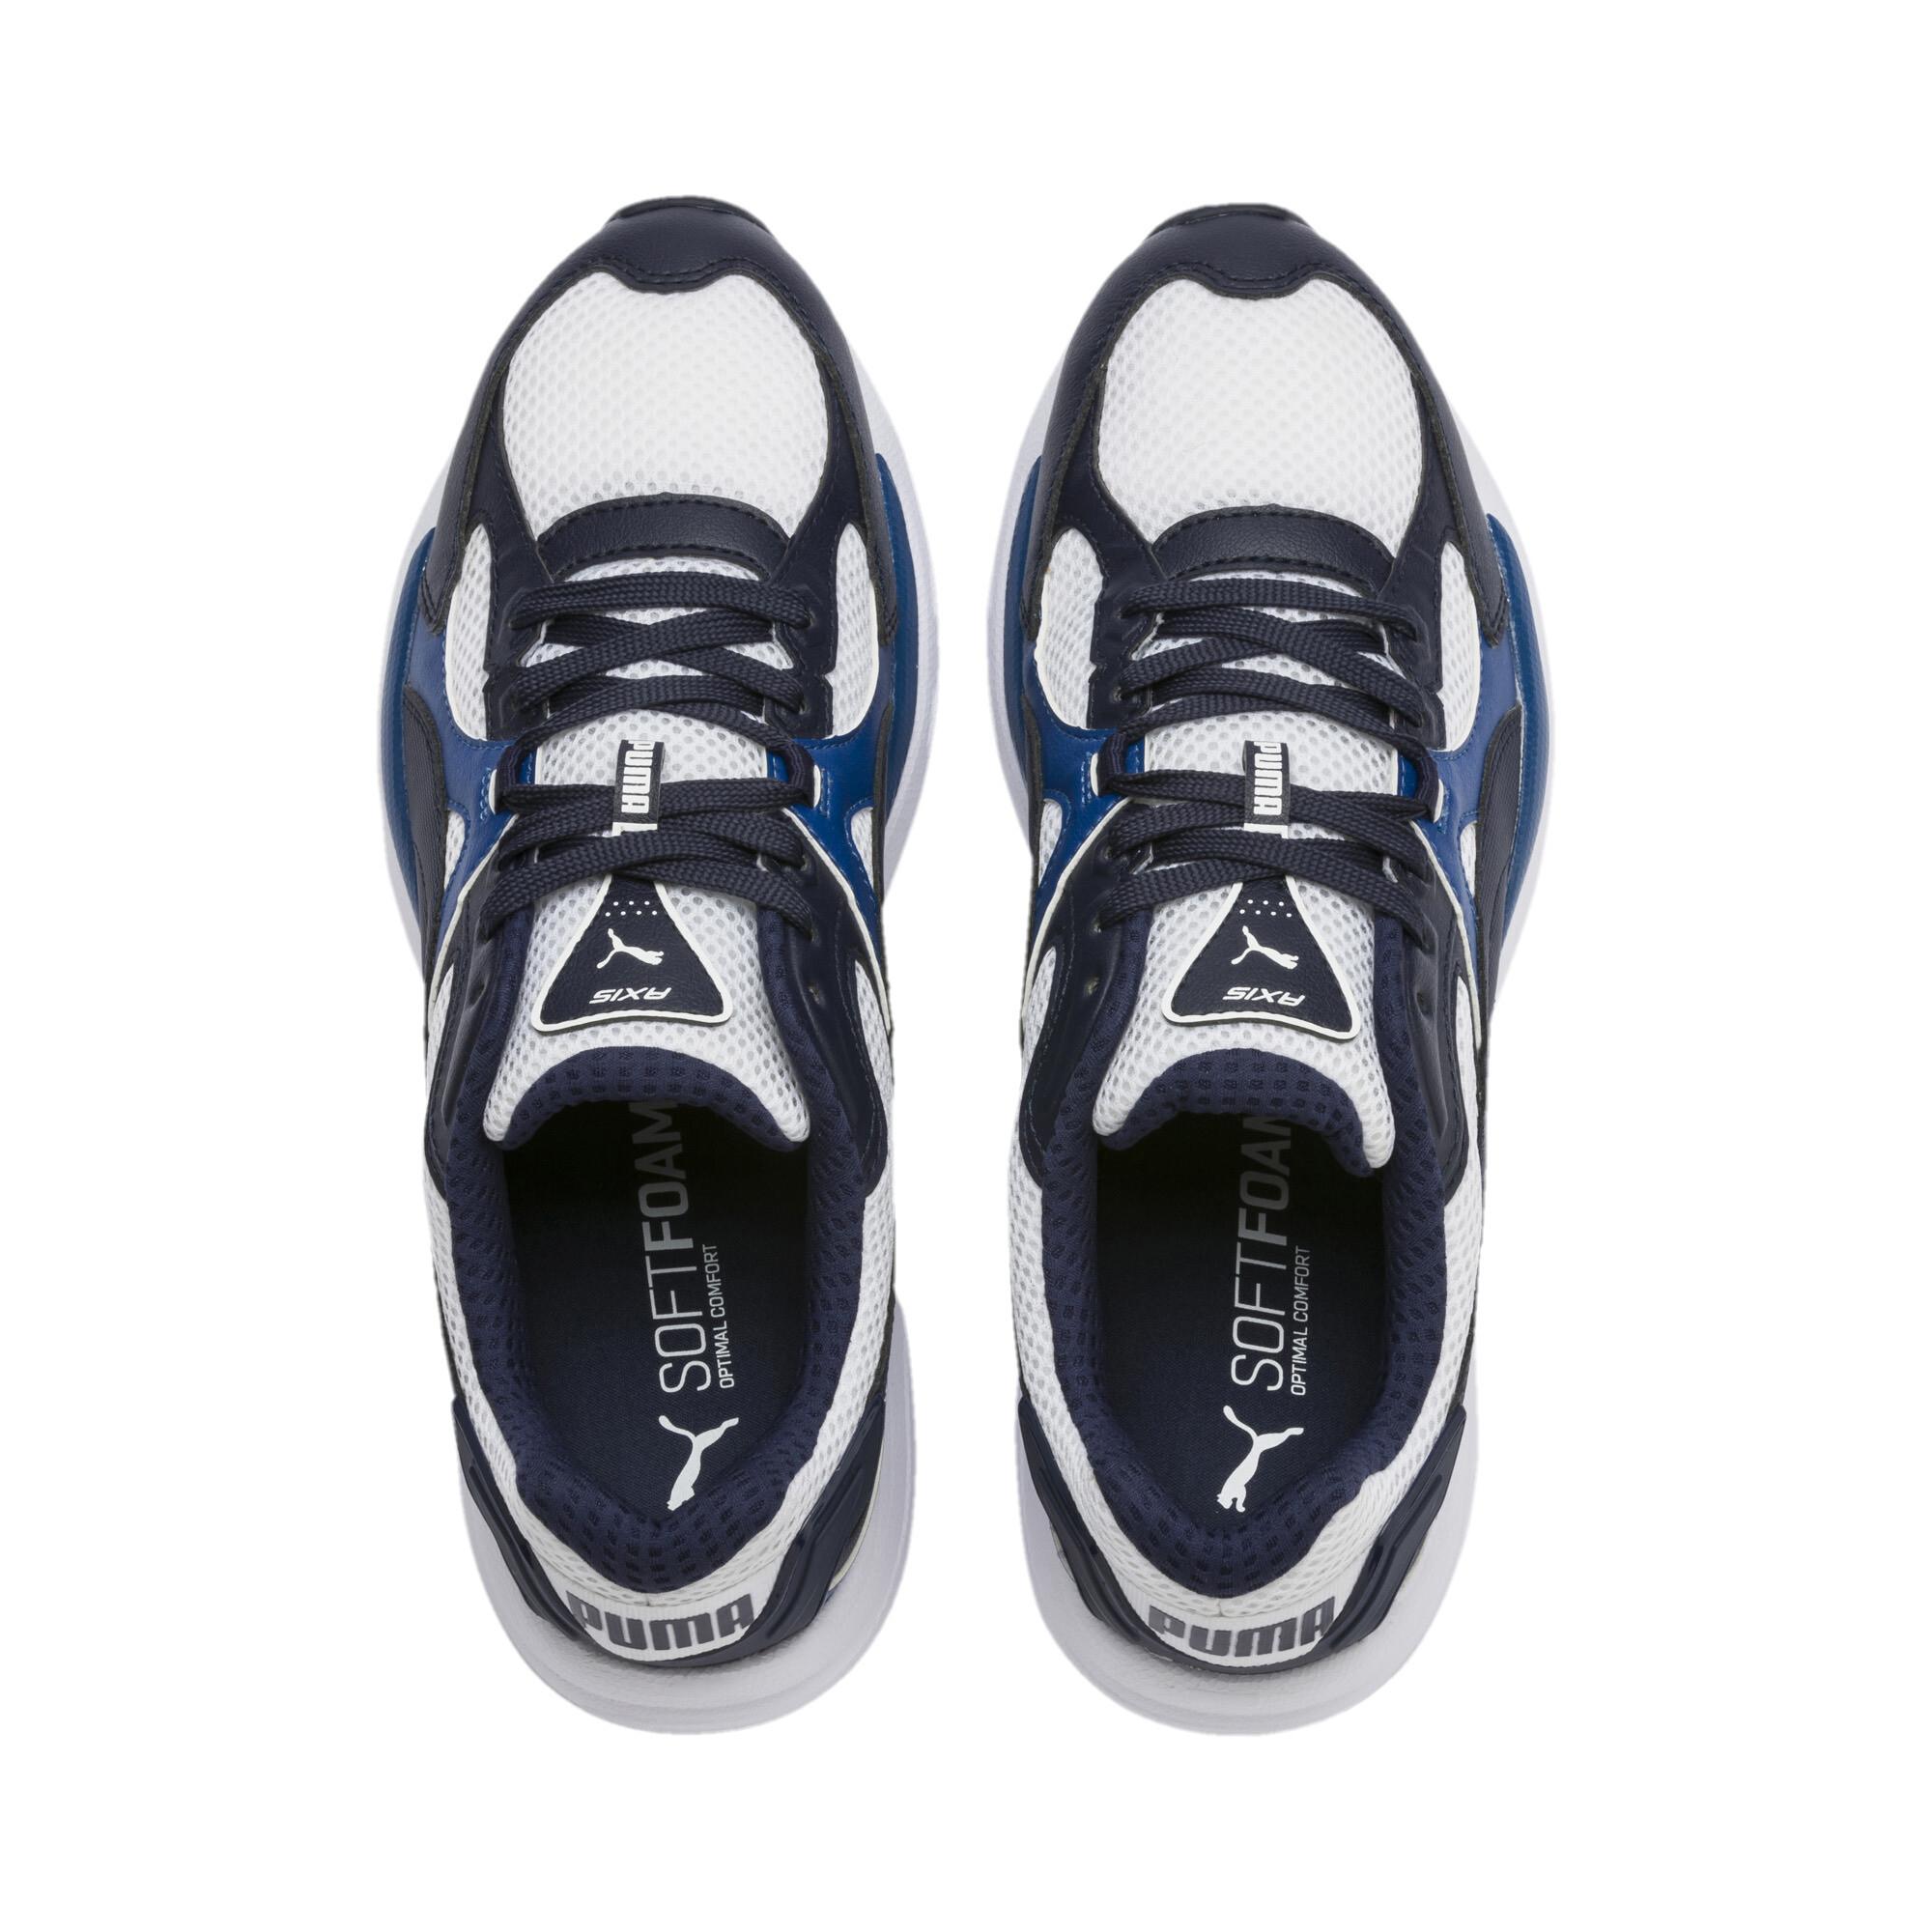 PUMA-Axis-Plus-90s-Sneakers-Men-Shoe-Basics thumbnail 28